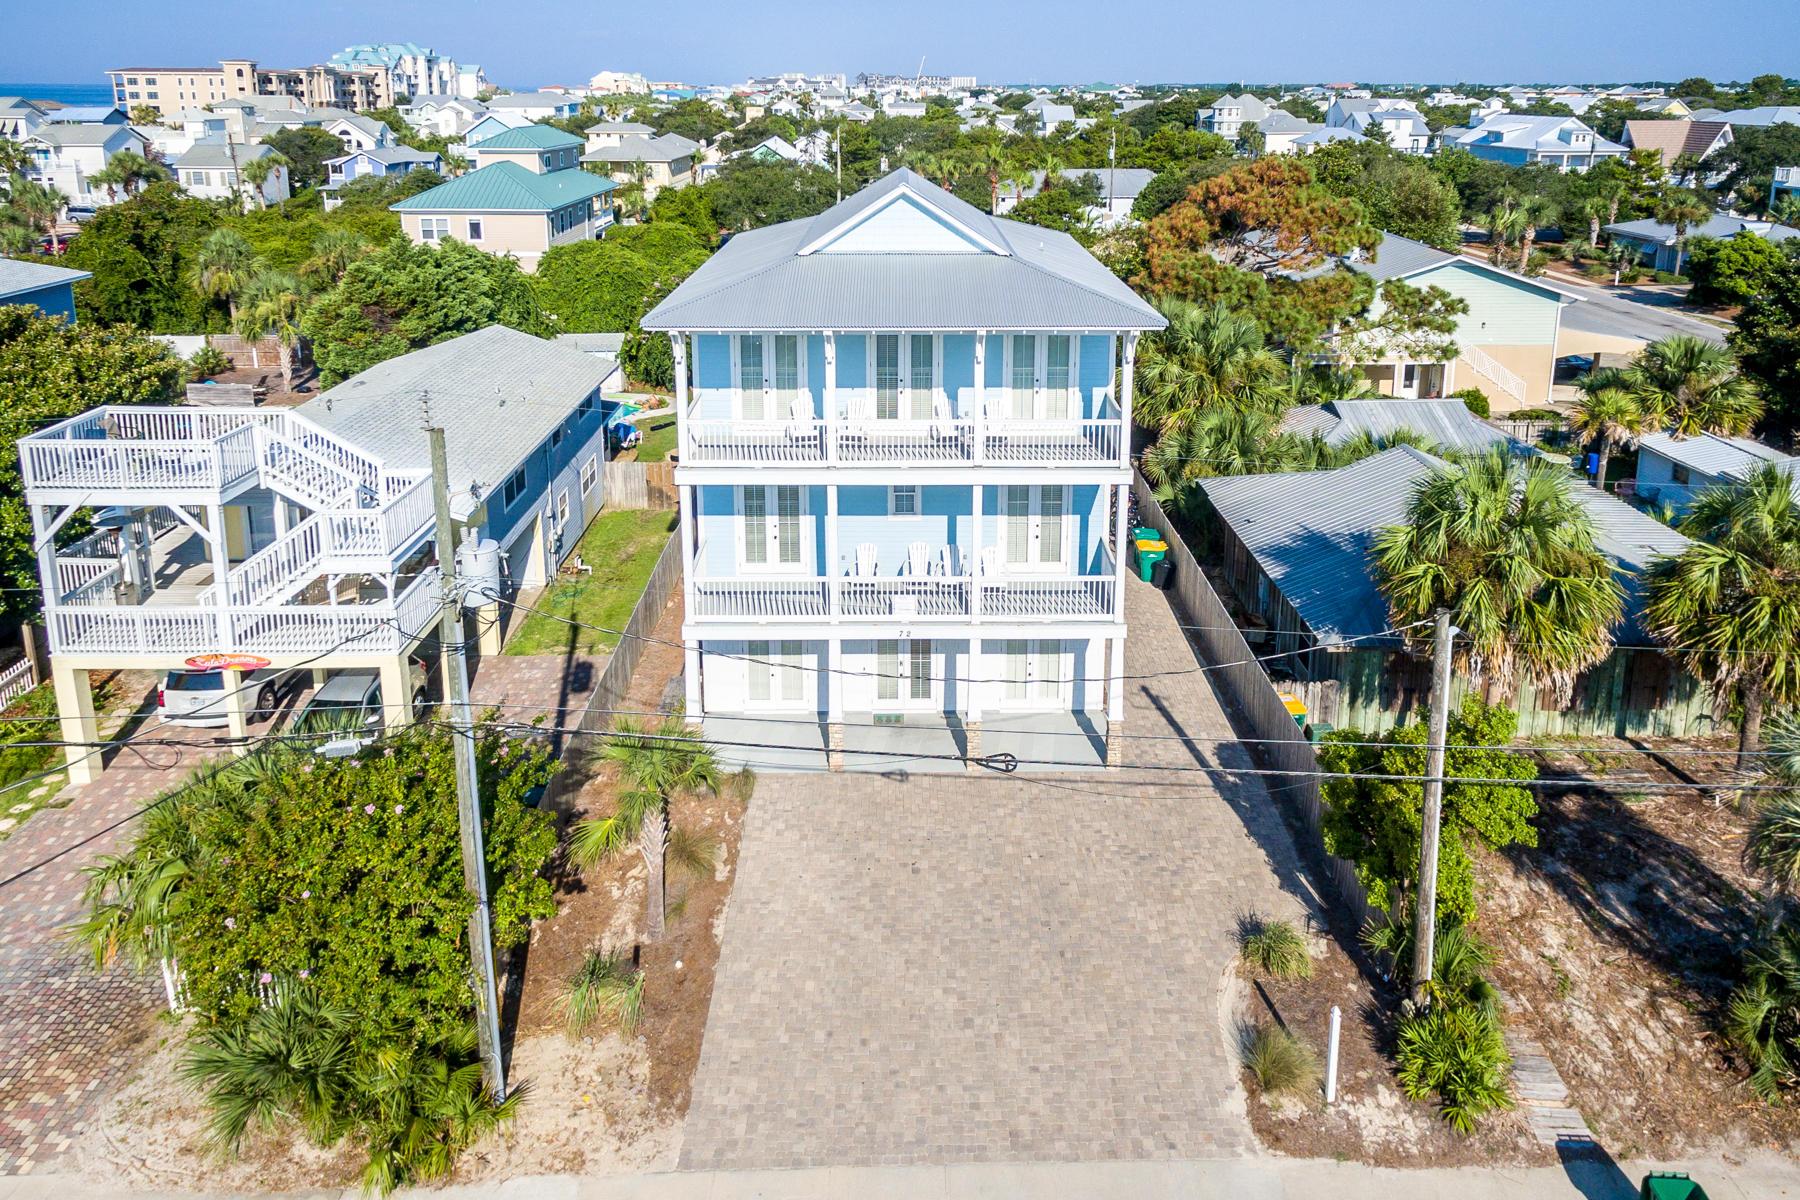 A 6 Bedroom 6 Bedroom Crystal Beach Home